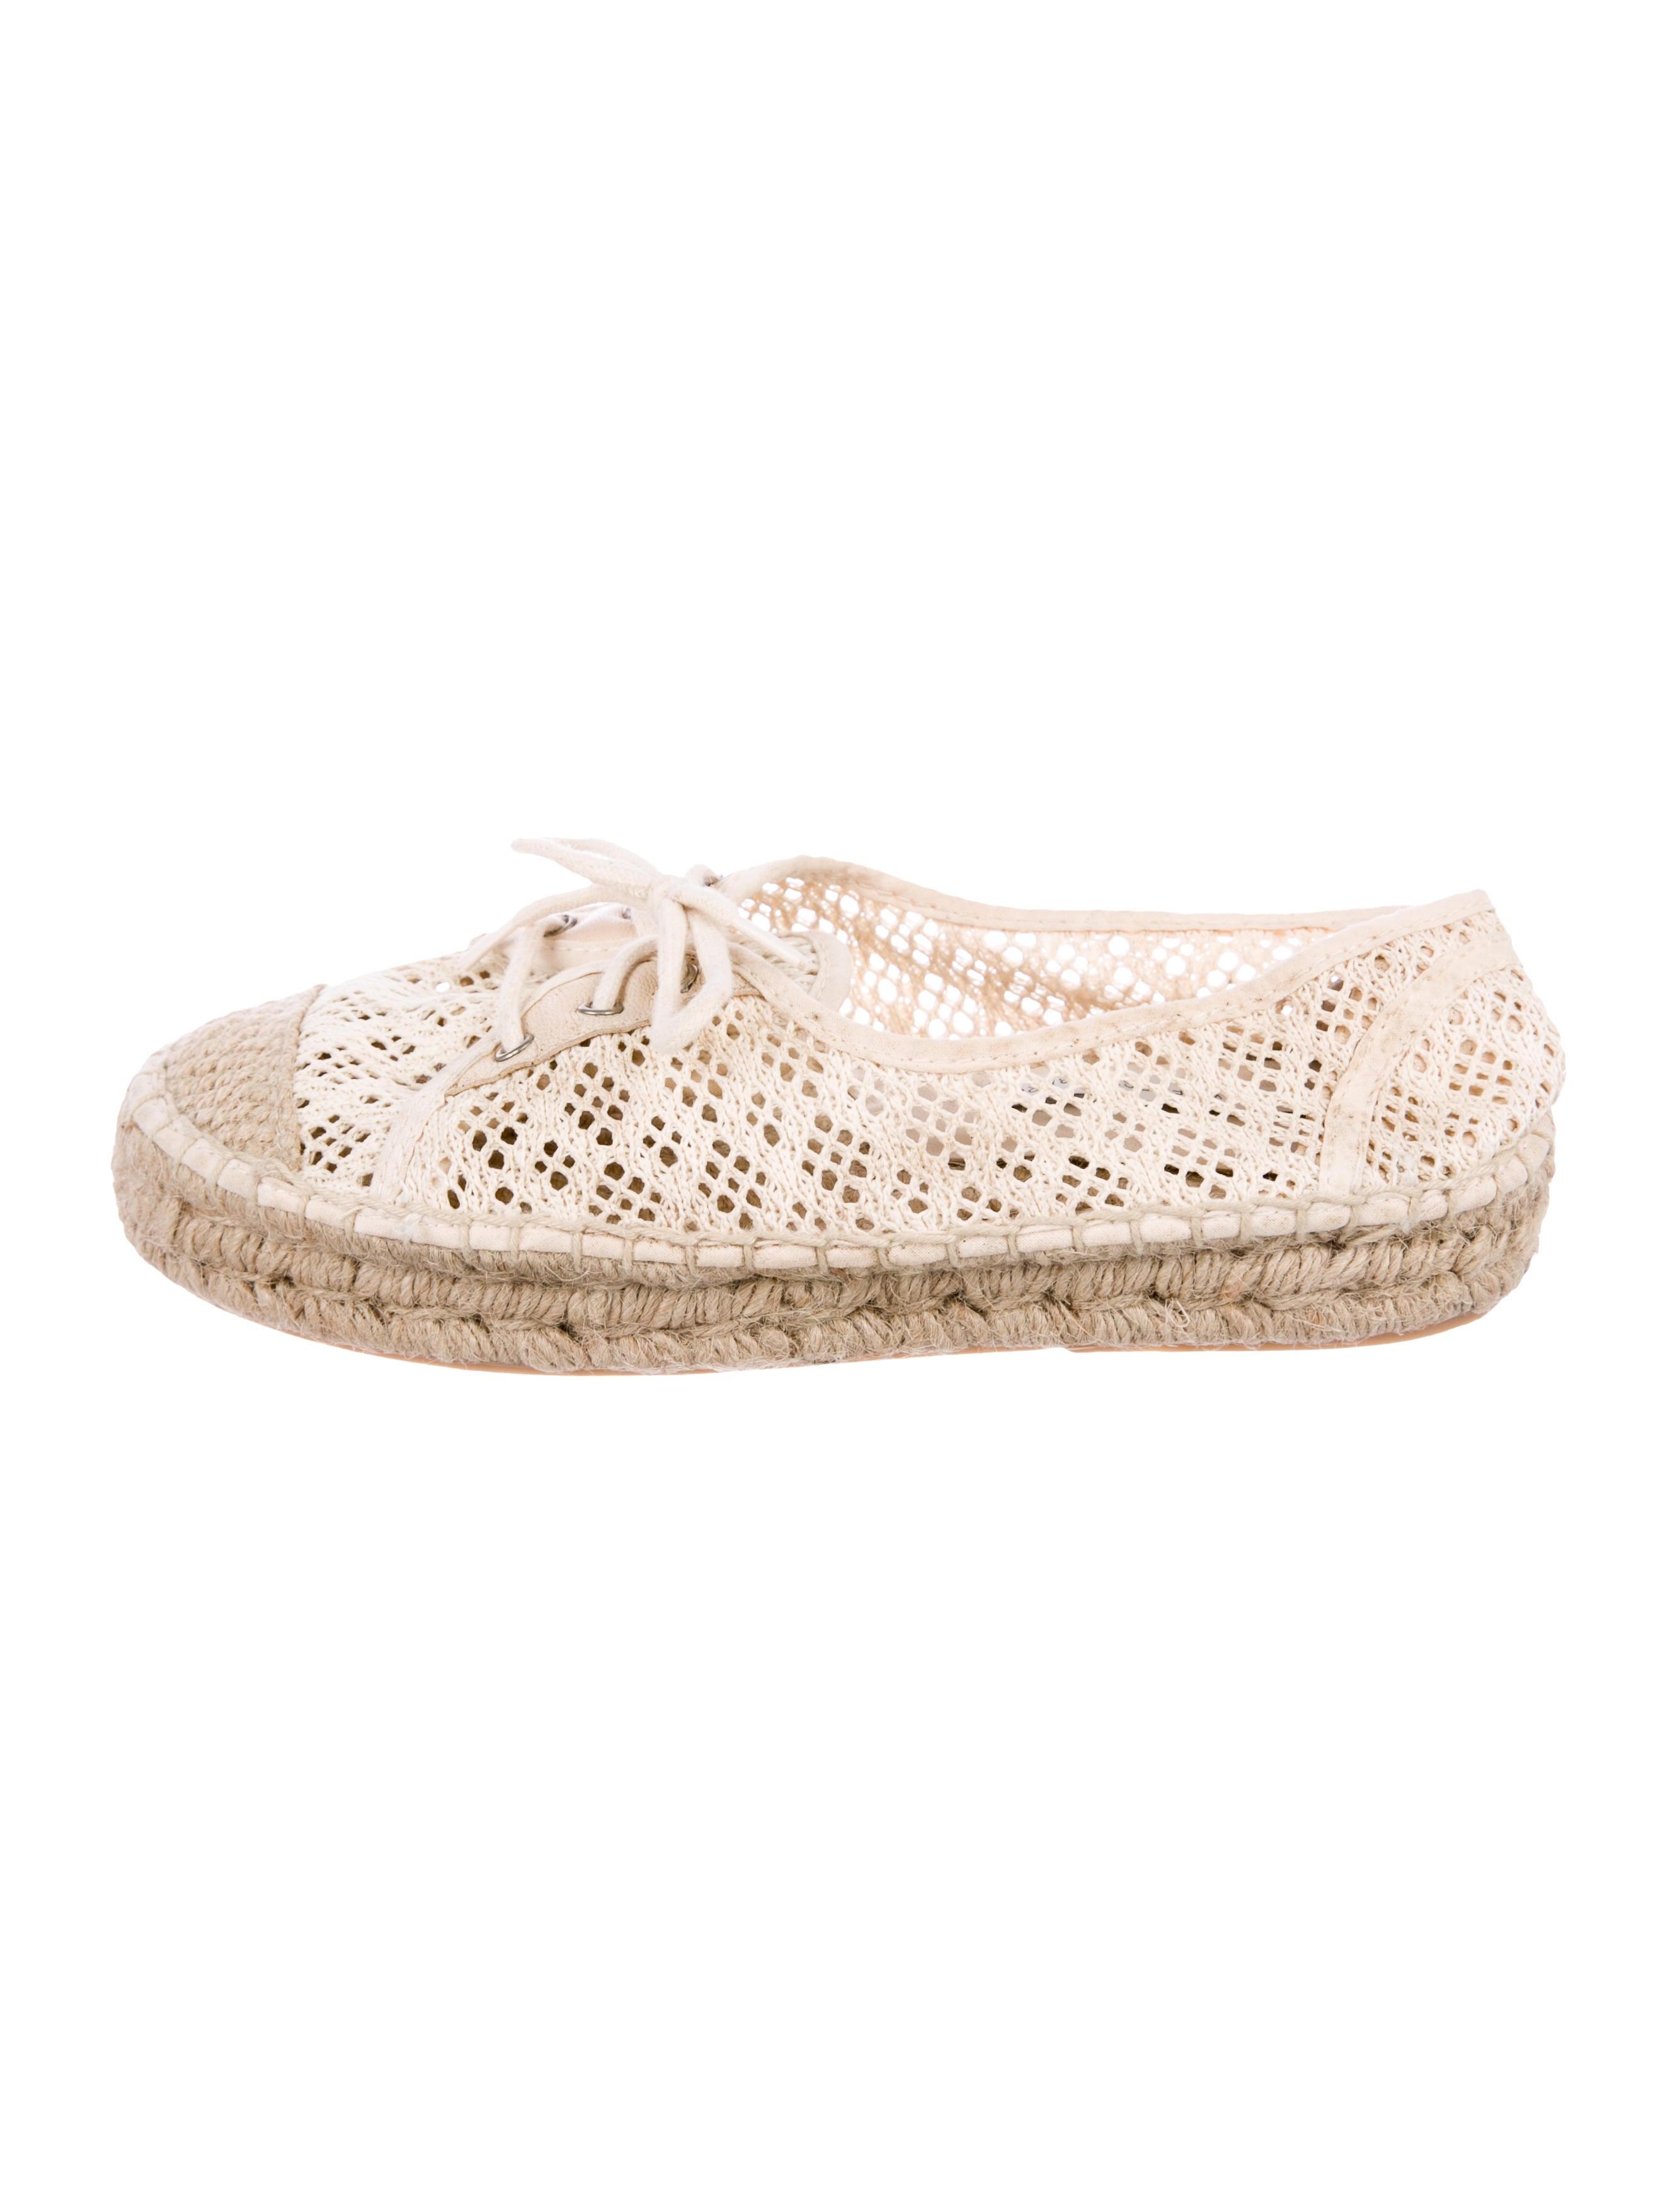 Diane von Furstenberg Crochet Espadrille Sneakers cheap discount sale S9sAul4F4